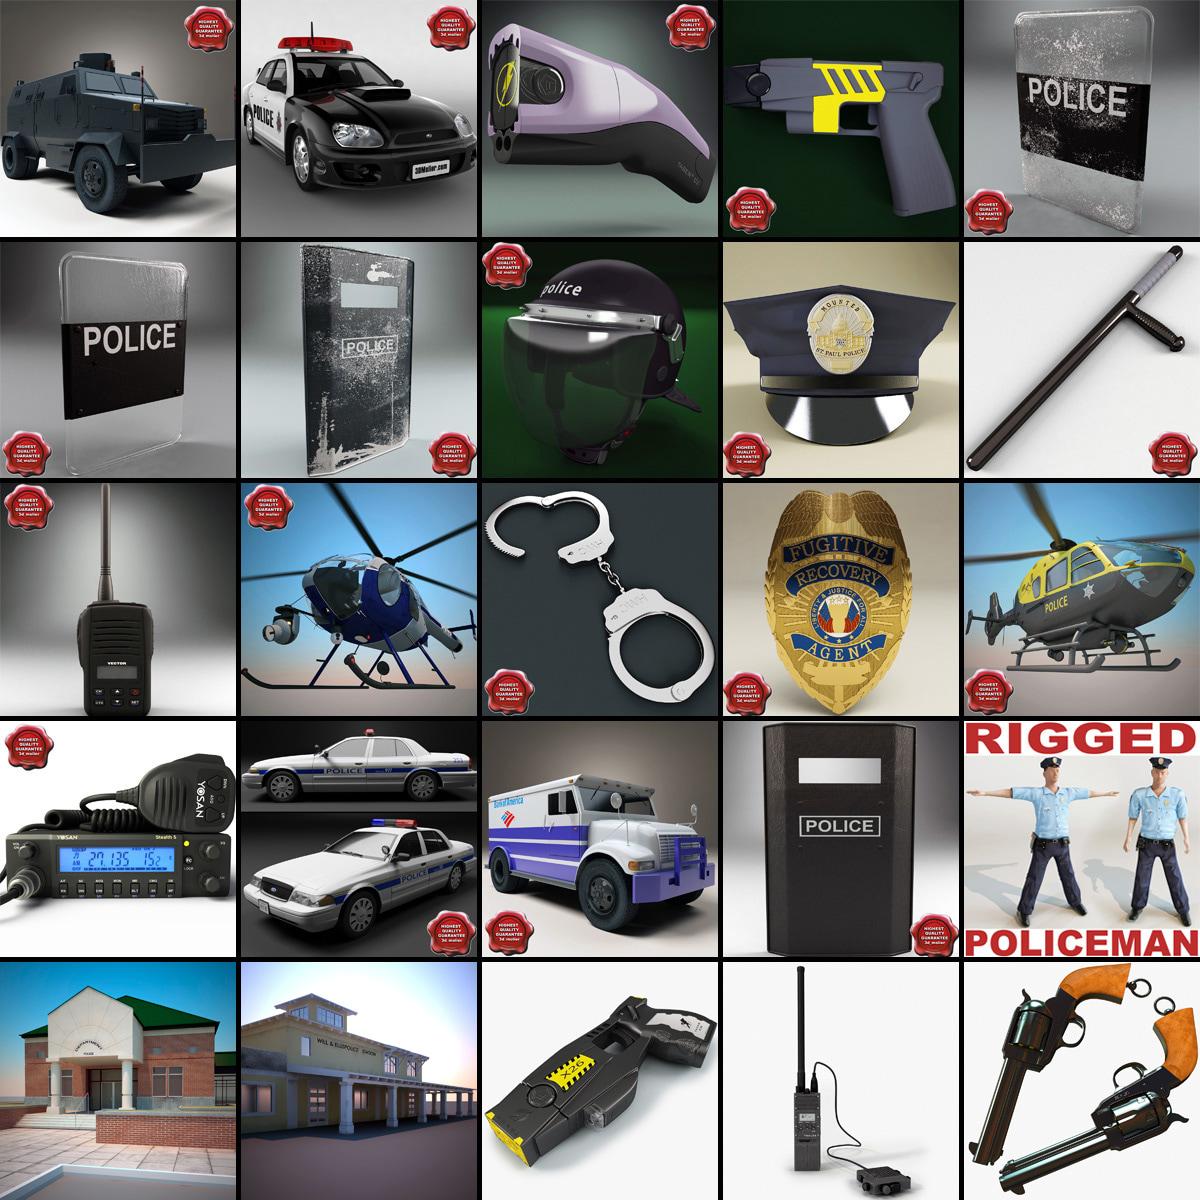 Police_Big_Collection_V2_000.jpg